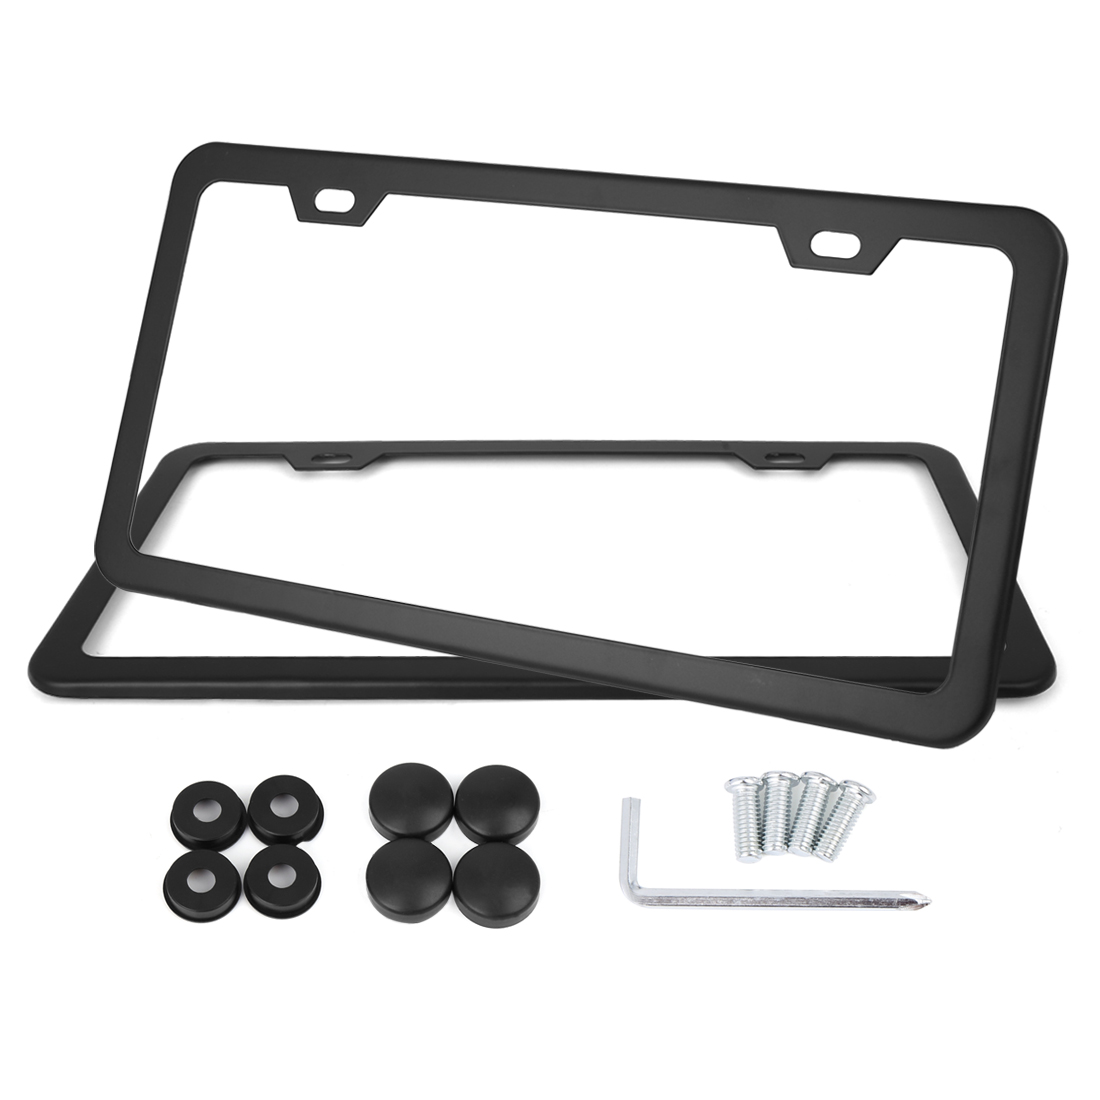 2 Pcs Black Stainless Steel Car License Plate Frame Holder w/ Screws - 4 Hole